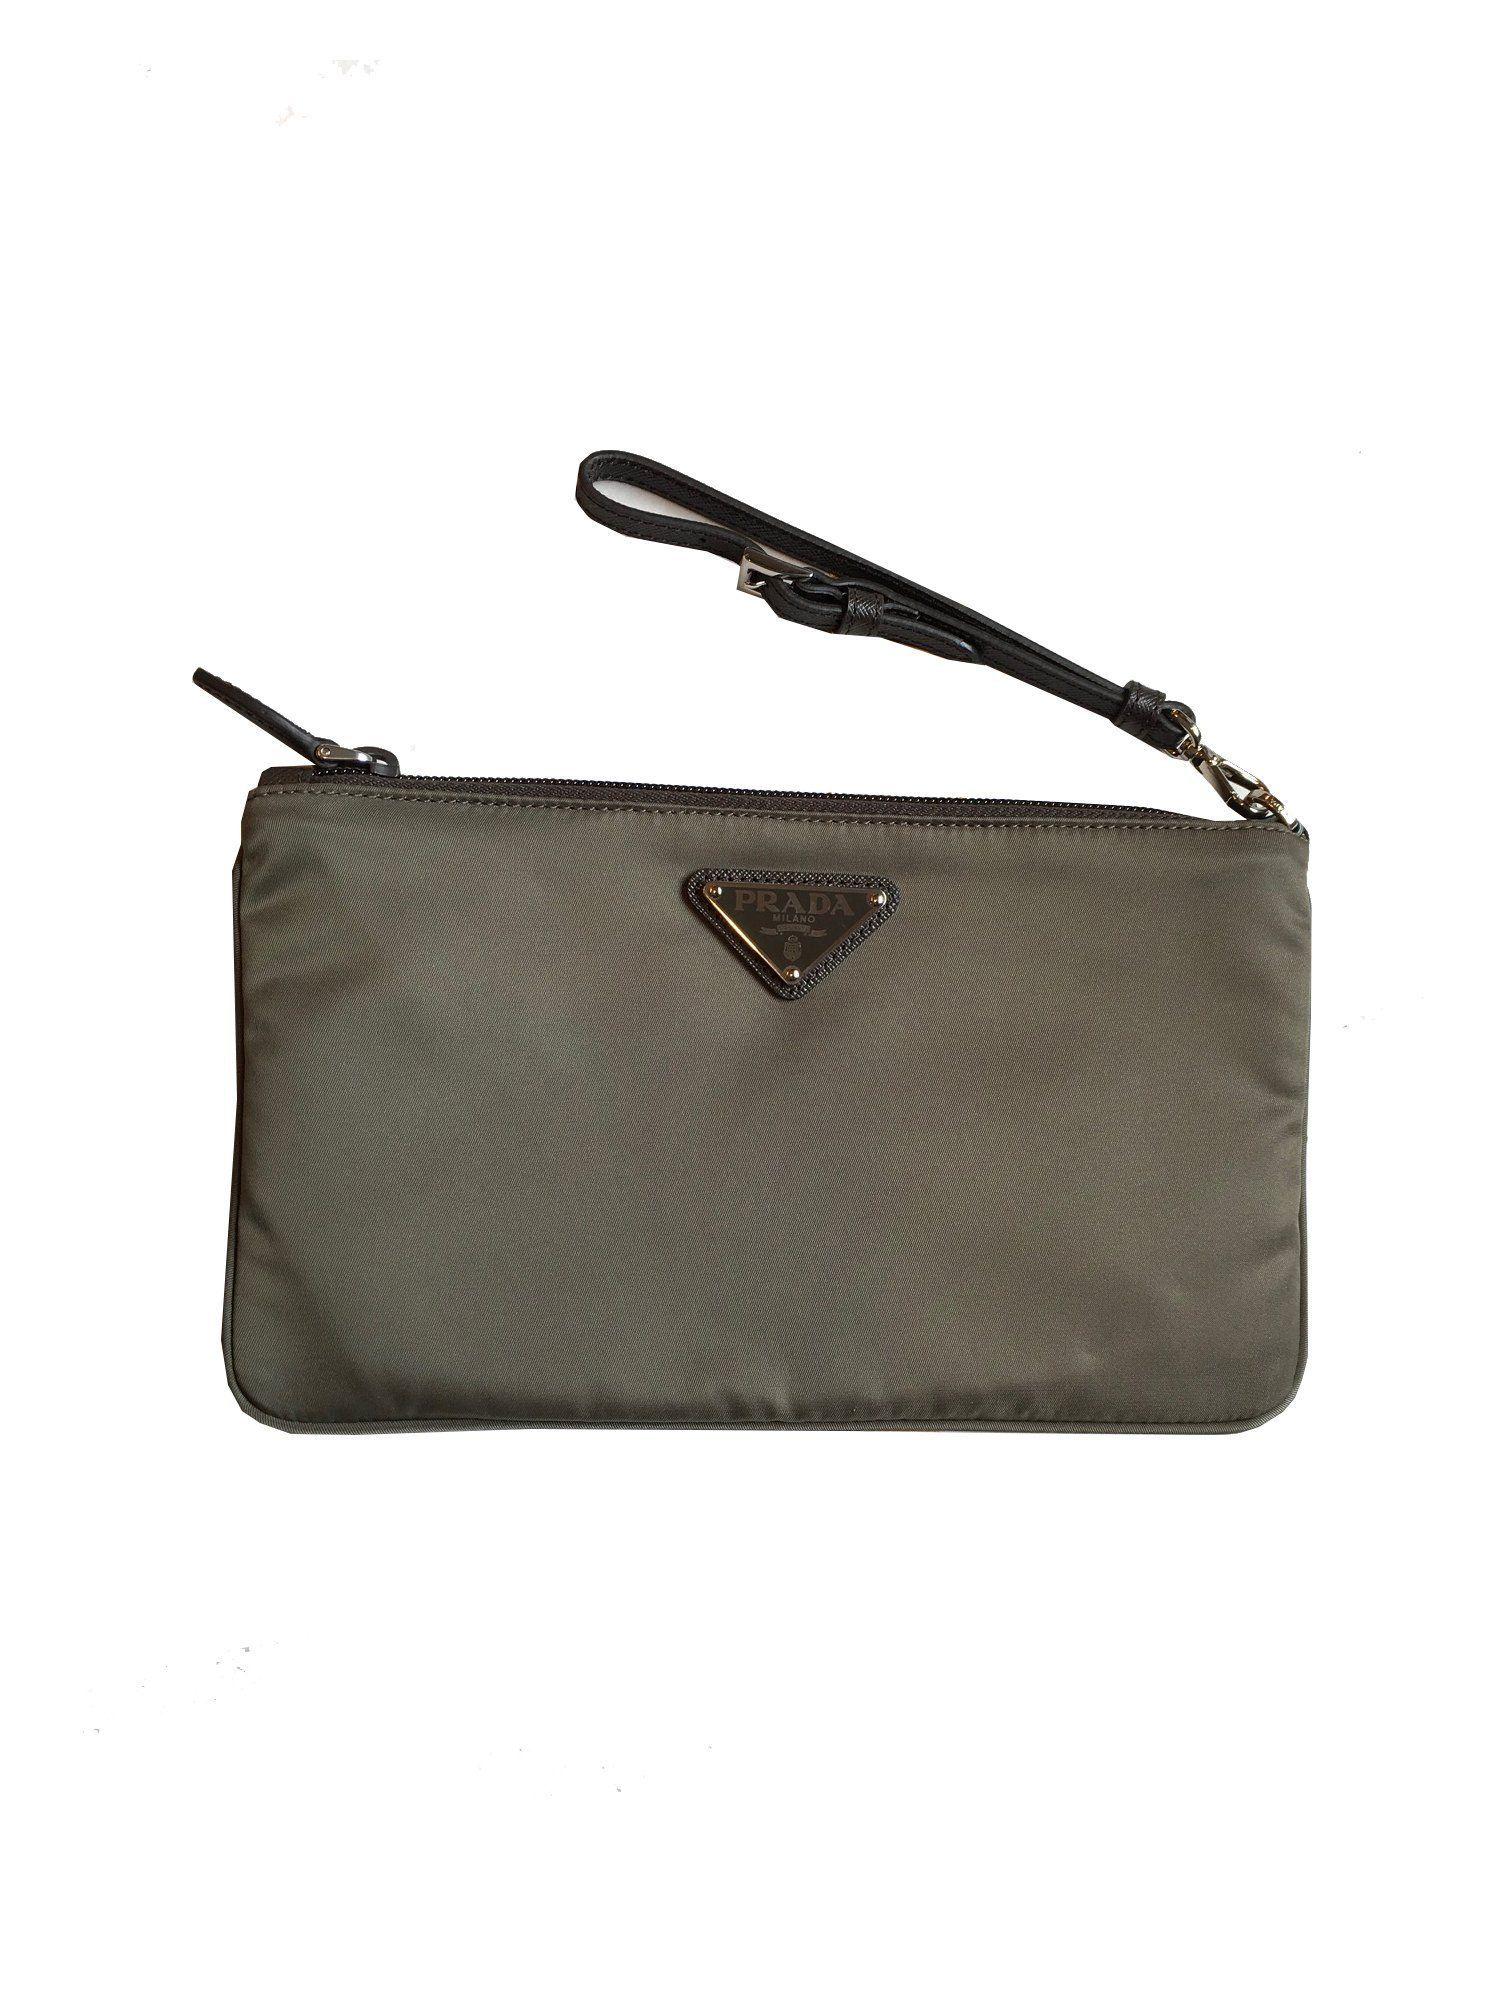 e4b32ca85ef053 Prada Women's Gray Nylon Cosmetic Case Clutch 1NH545 #Prada #Handbags  #Fendi #Luxury #Balenciaga #Gucci #QueenBeeofBeverlyHills #DesignerHandbags  #Fashion # ...